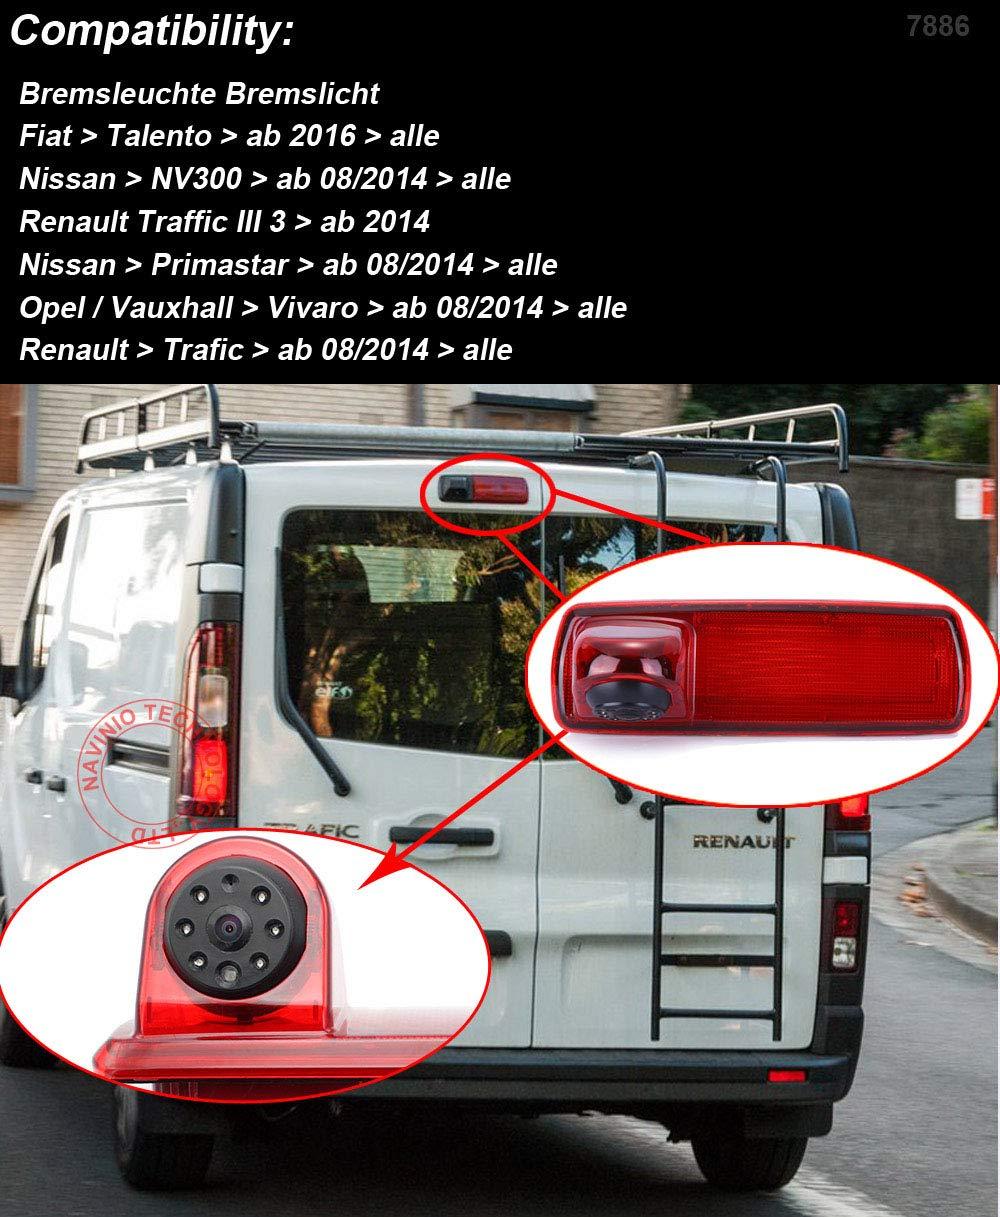 Dynavision-Auto-Dritte-Dach-Top-Mount-Bremsleuchte-Kamera-Bremslicht-Rckfahrkamera-fr-FIAT-Talento-Nissan-NV300-Primastar-Renault-Traffic-3-opel-Vauxhall-vivaro7-LCD-TFT-Monitor-HD